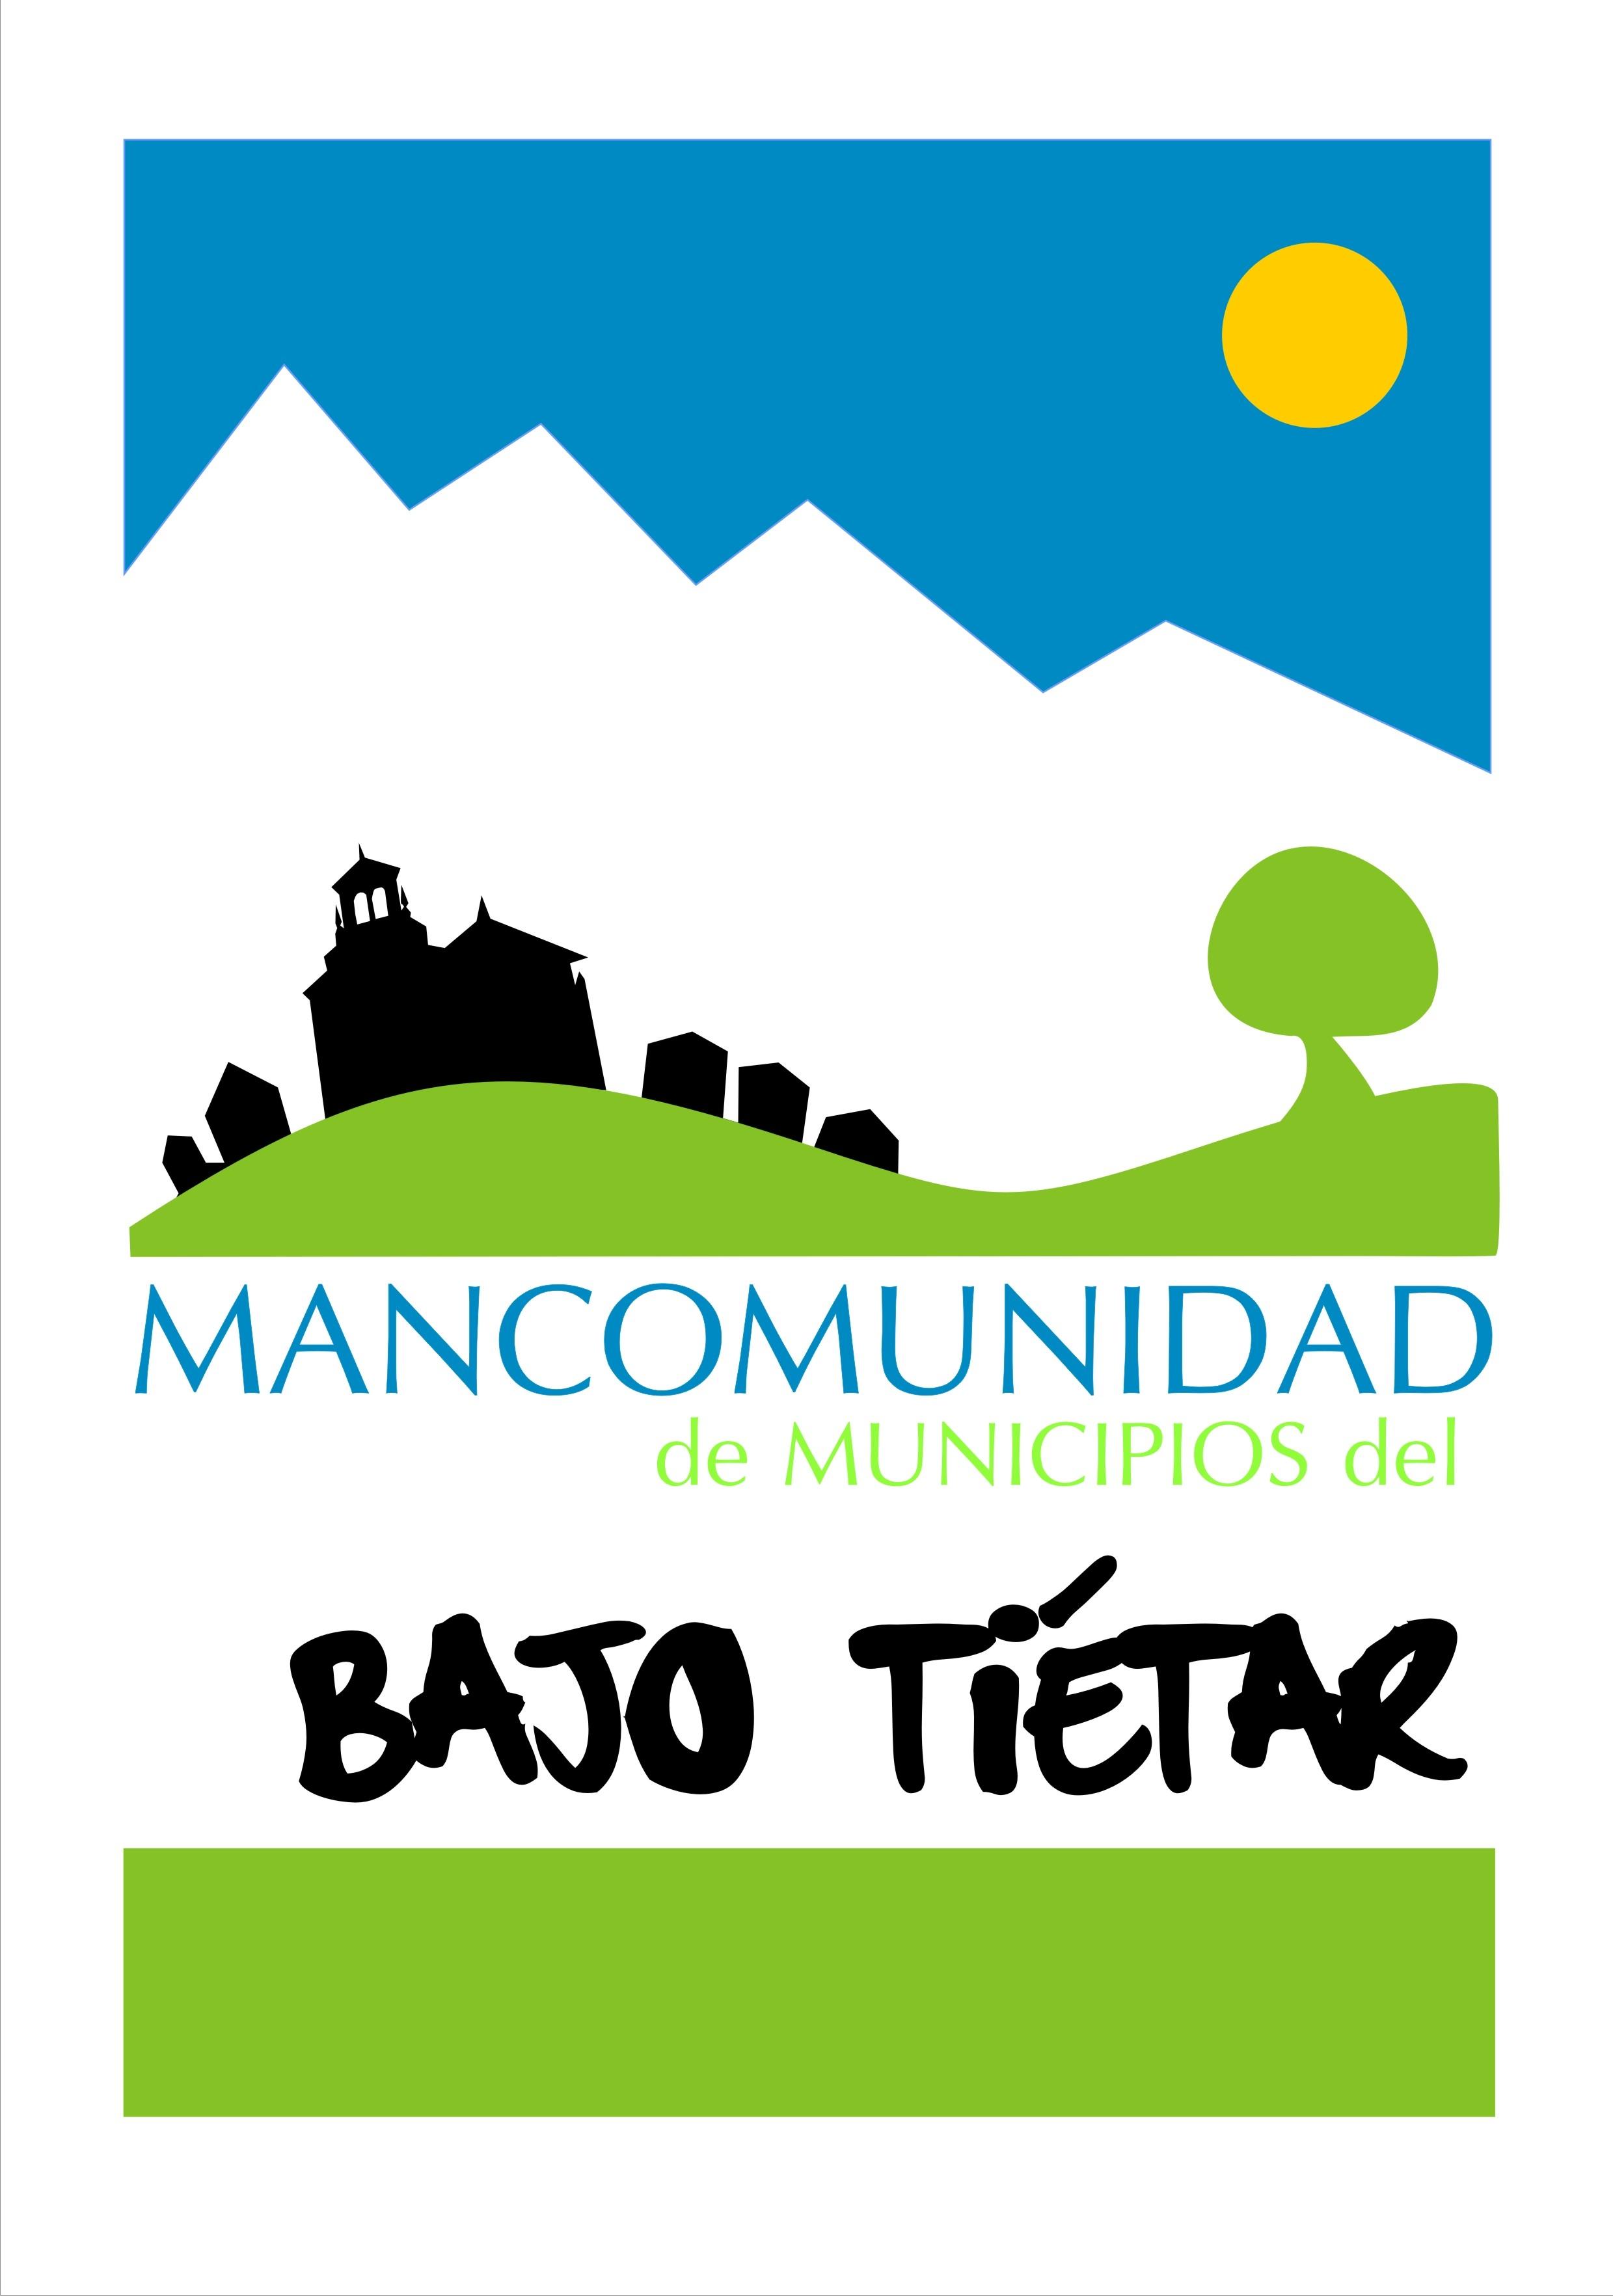 Logo Mancomunidad de Municipios del Bajo Tiétar - TiétarTeVe